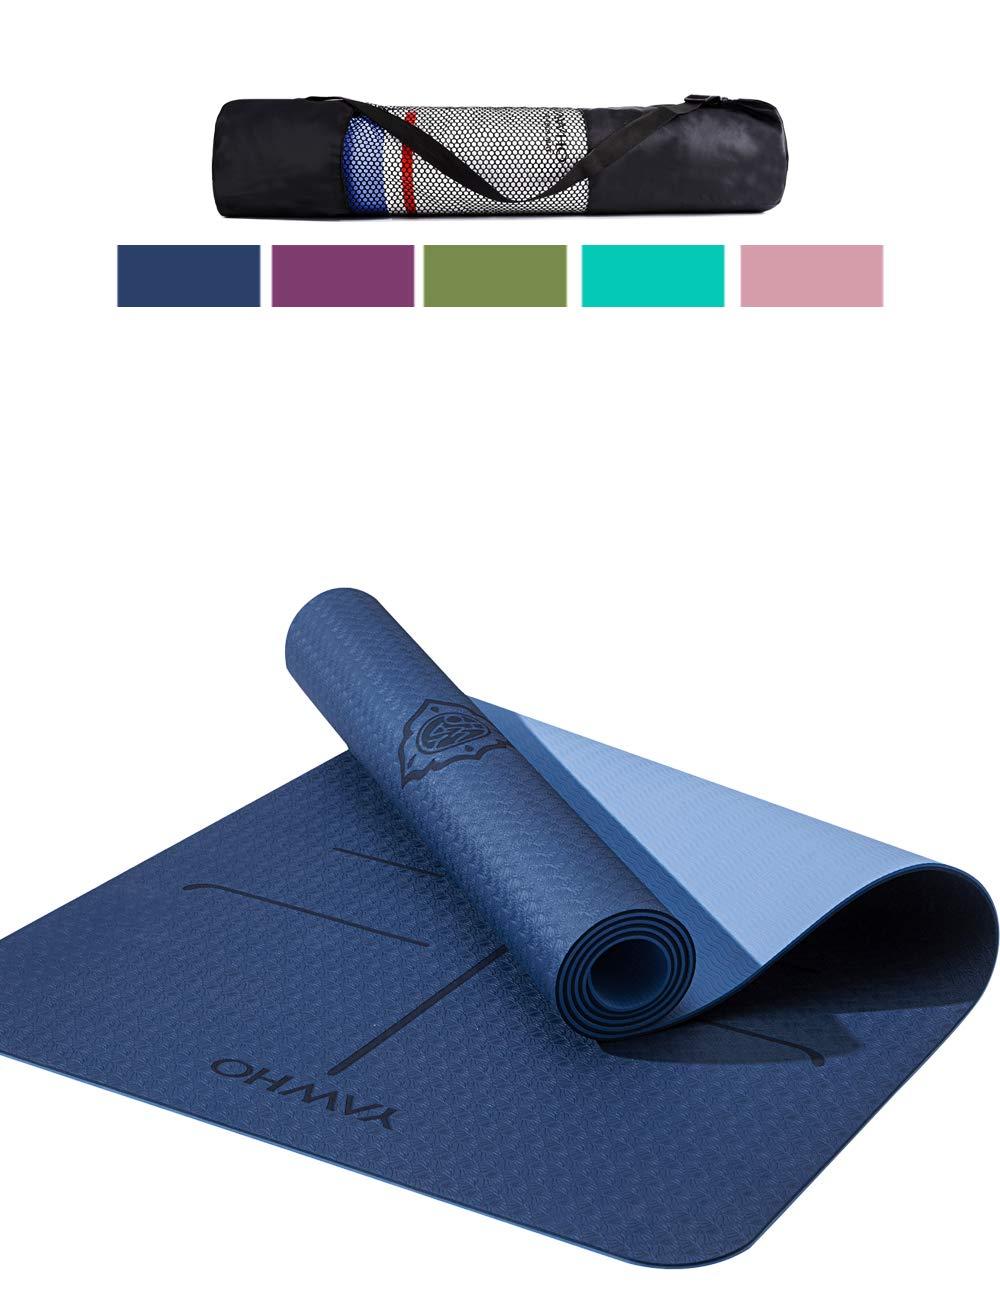 YAWHO Colchoneta de Yoga Esterilla Yoga Material medioambiental TPE,Modelo:183cmx66cm Espesor:6milímetros,Tapete de Deporte Grande y Antideslizante,Correas ...